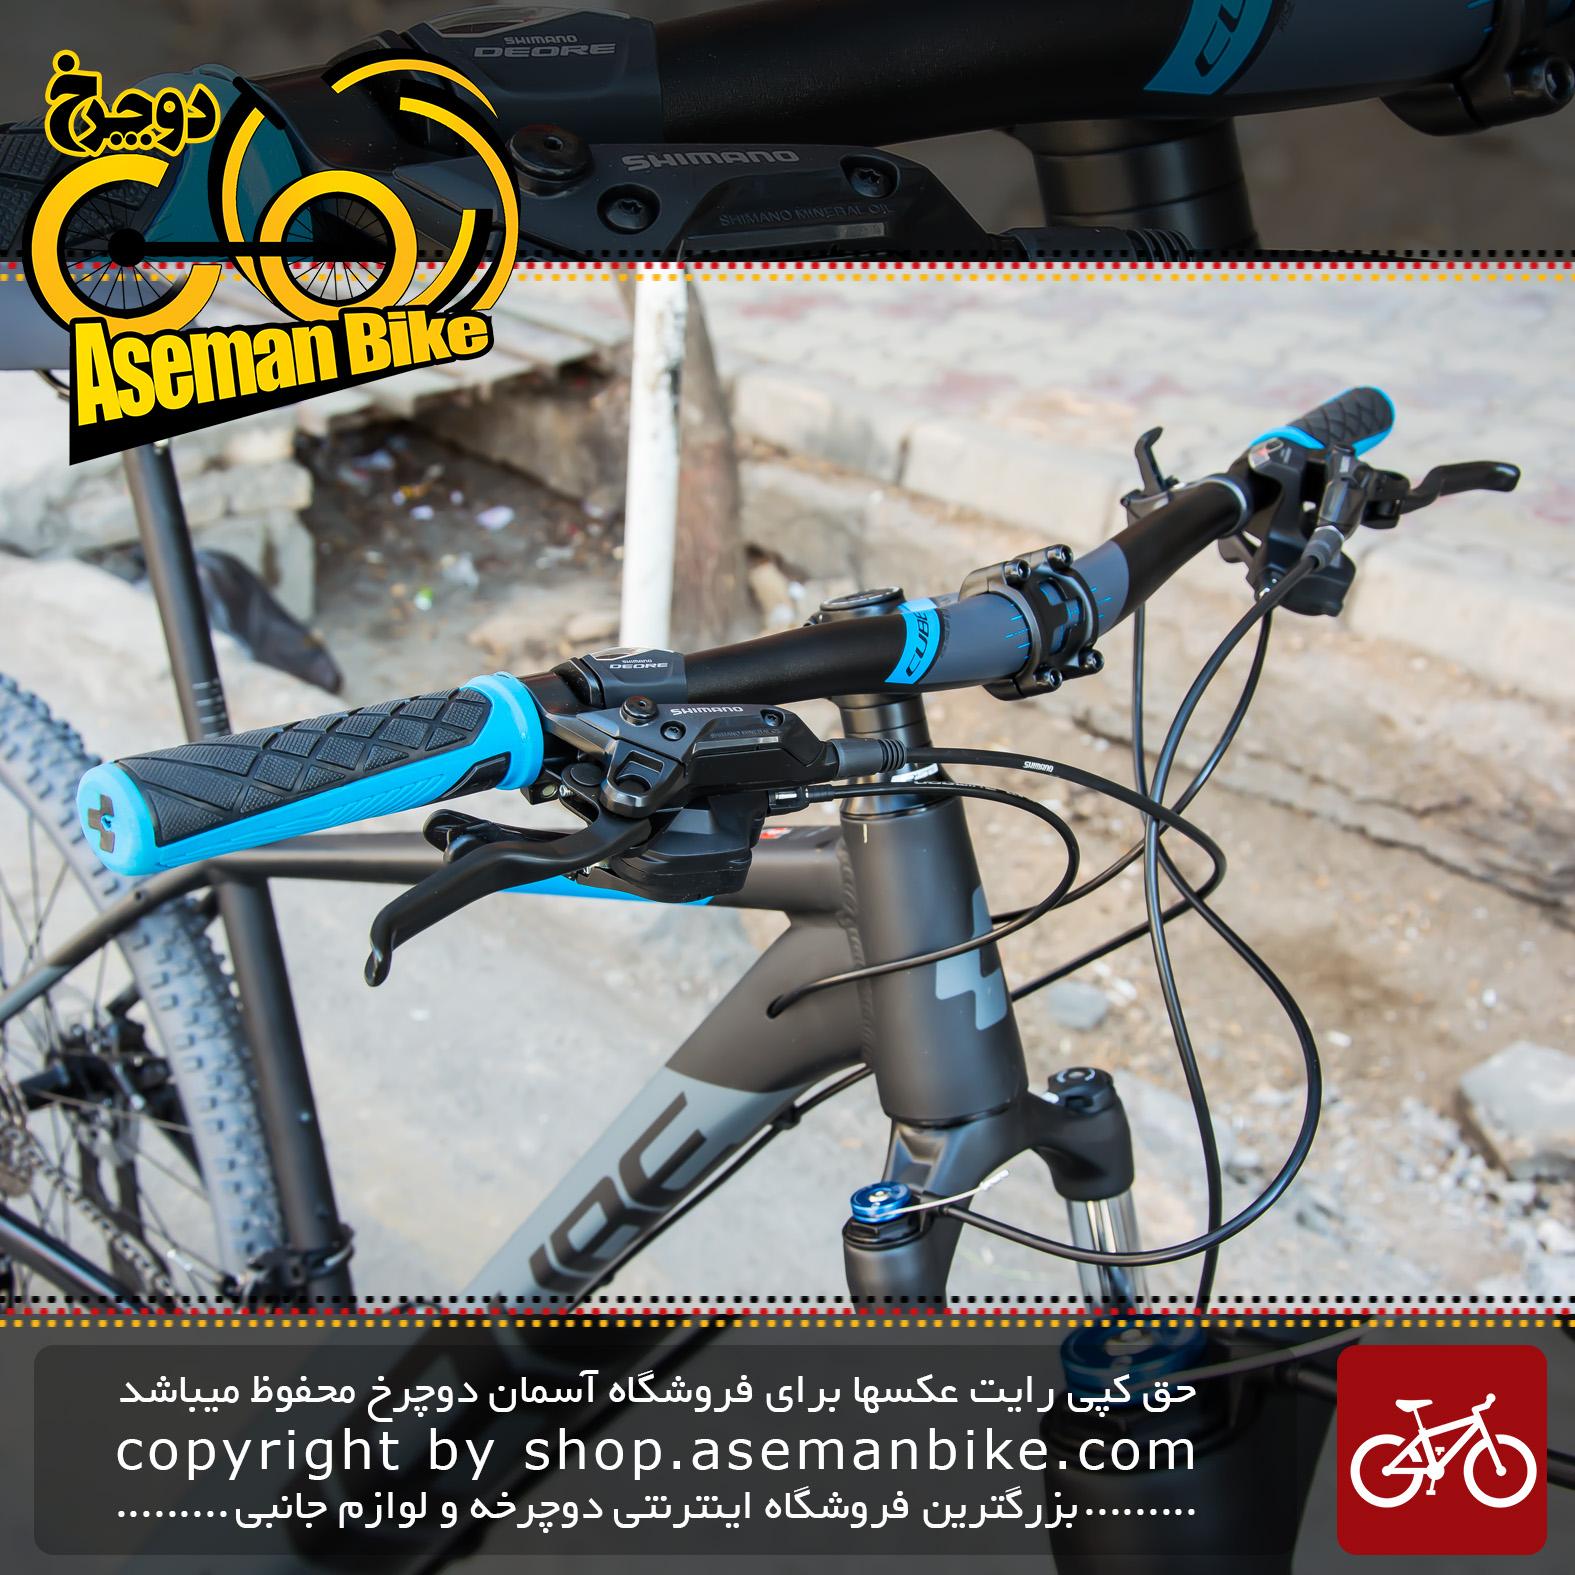 دوچرخه کوهستان کیوب مدل اتنشن سایز 27.5 2018 CUBE Off Road ATTENTION 2018 27.5